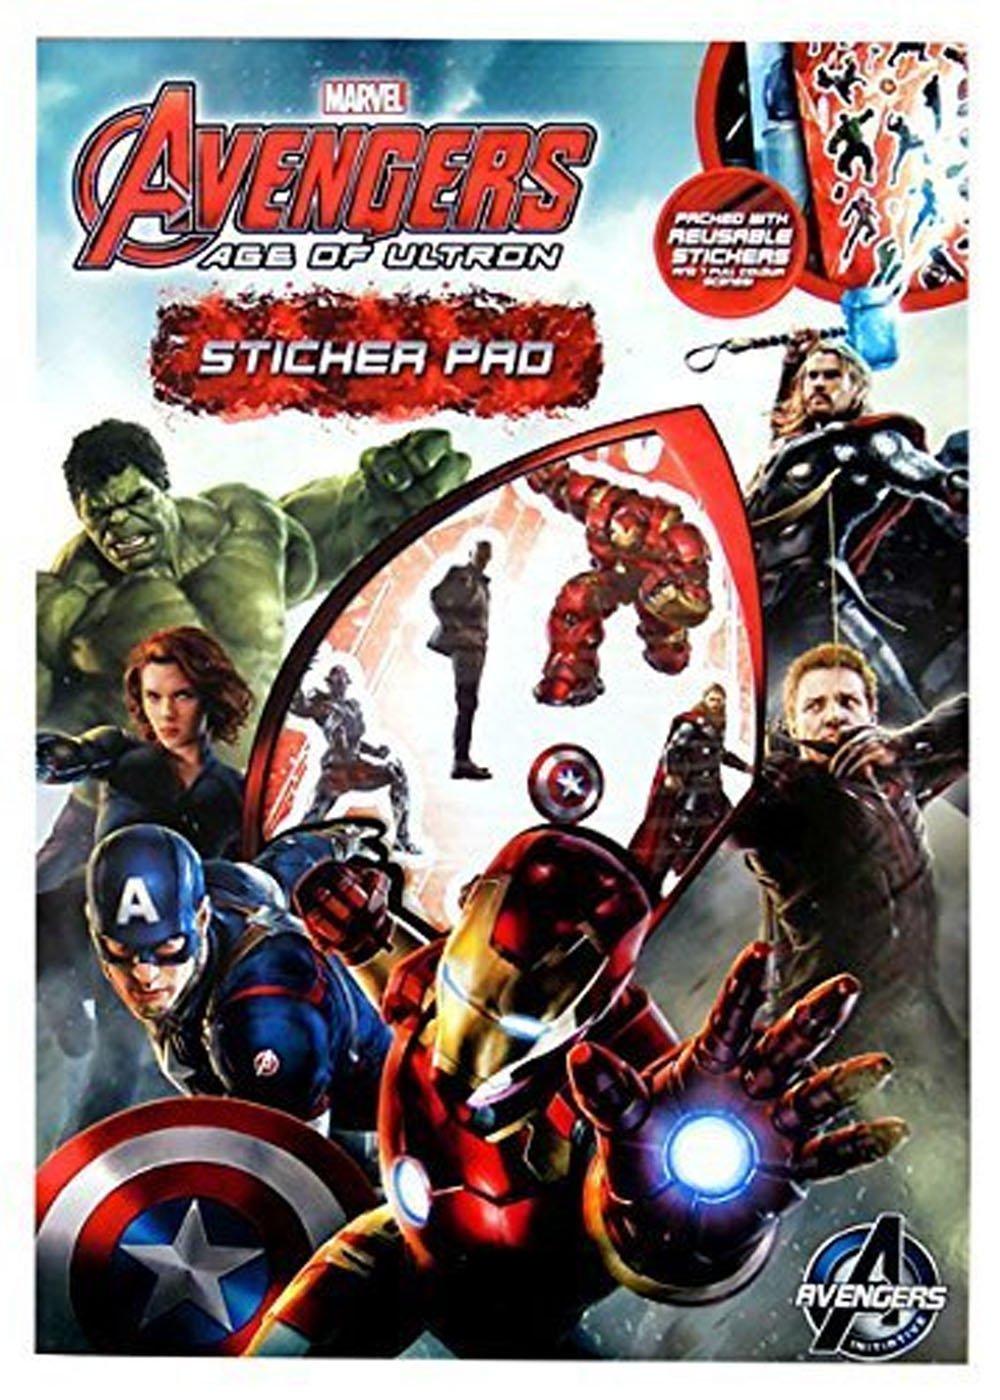 Avengers Age of Ultron Sticker Pad